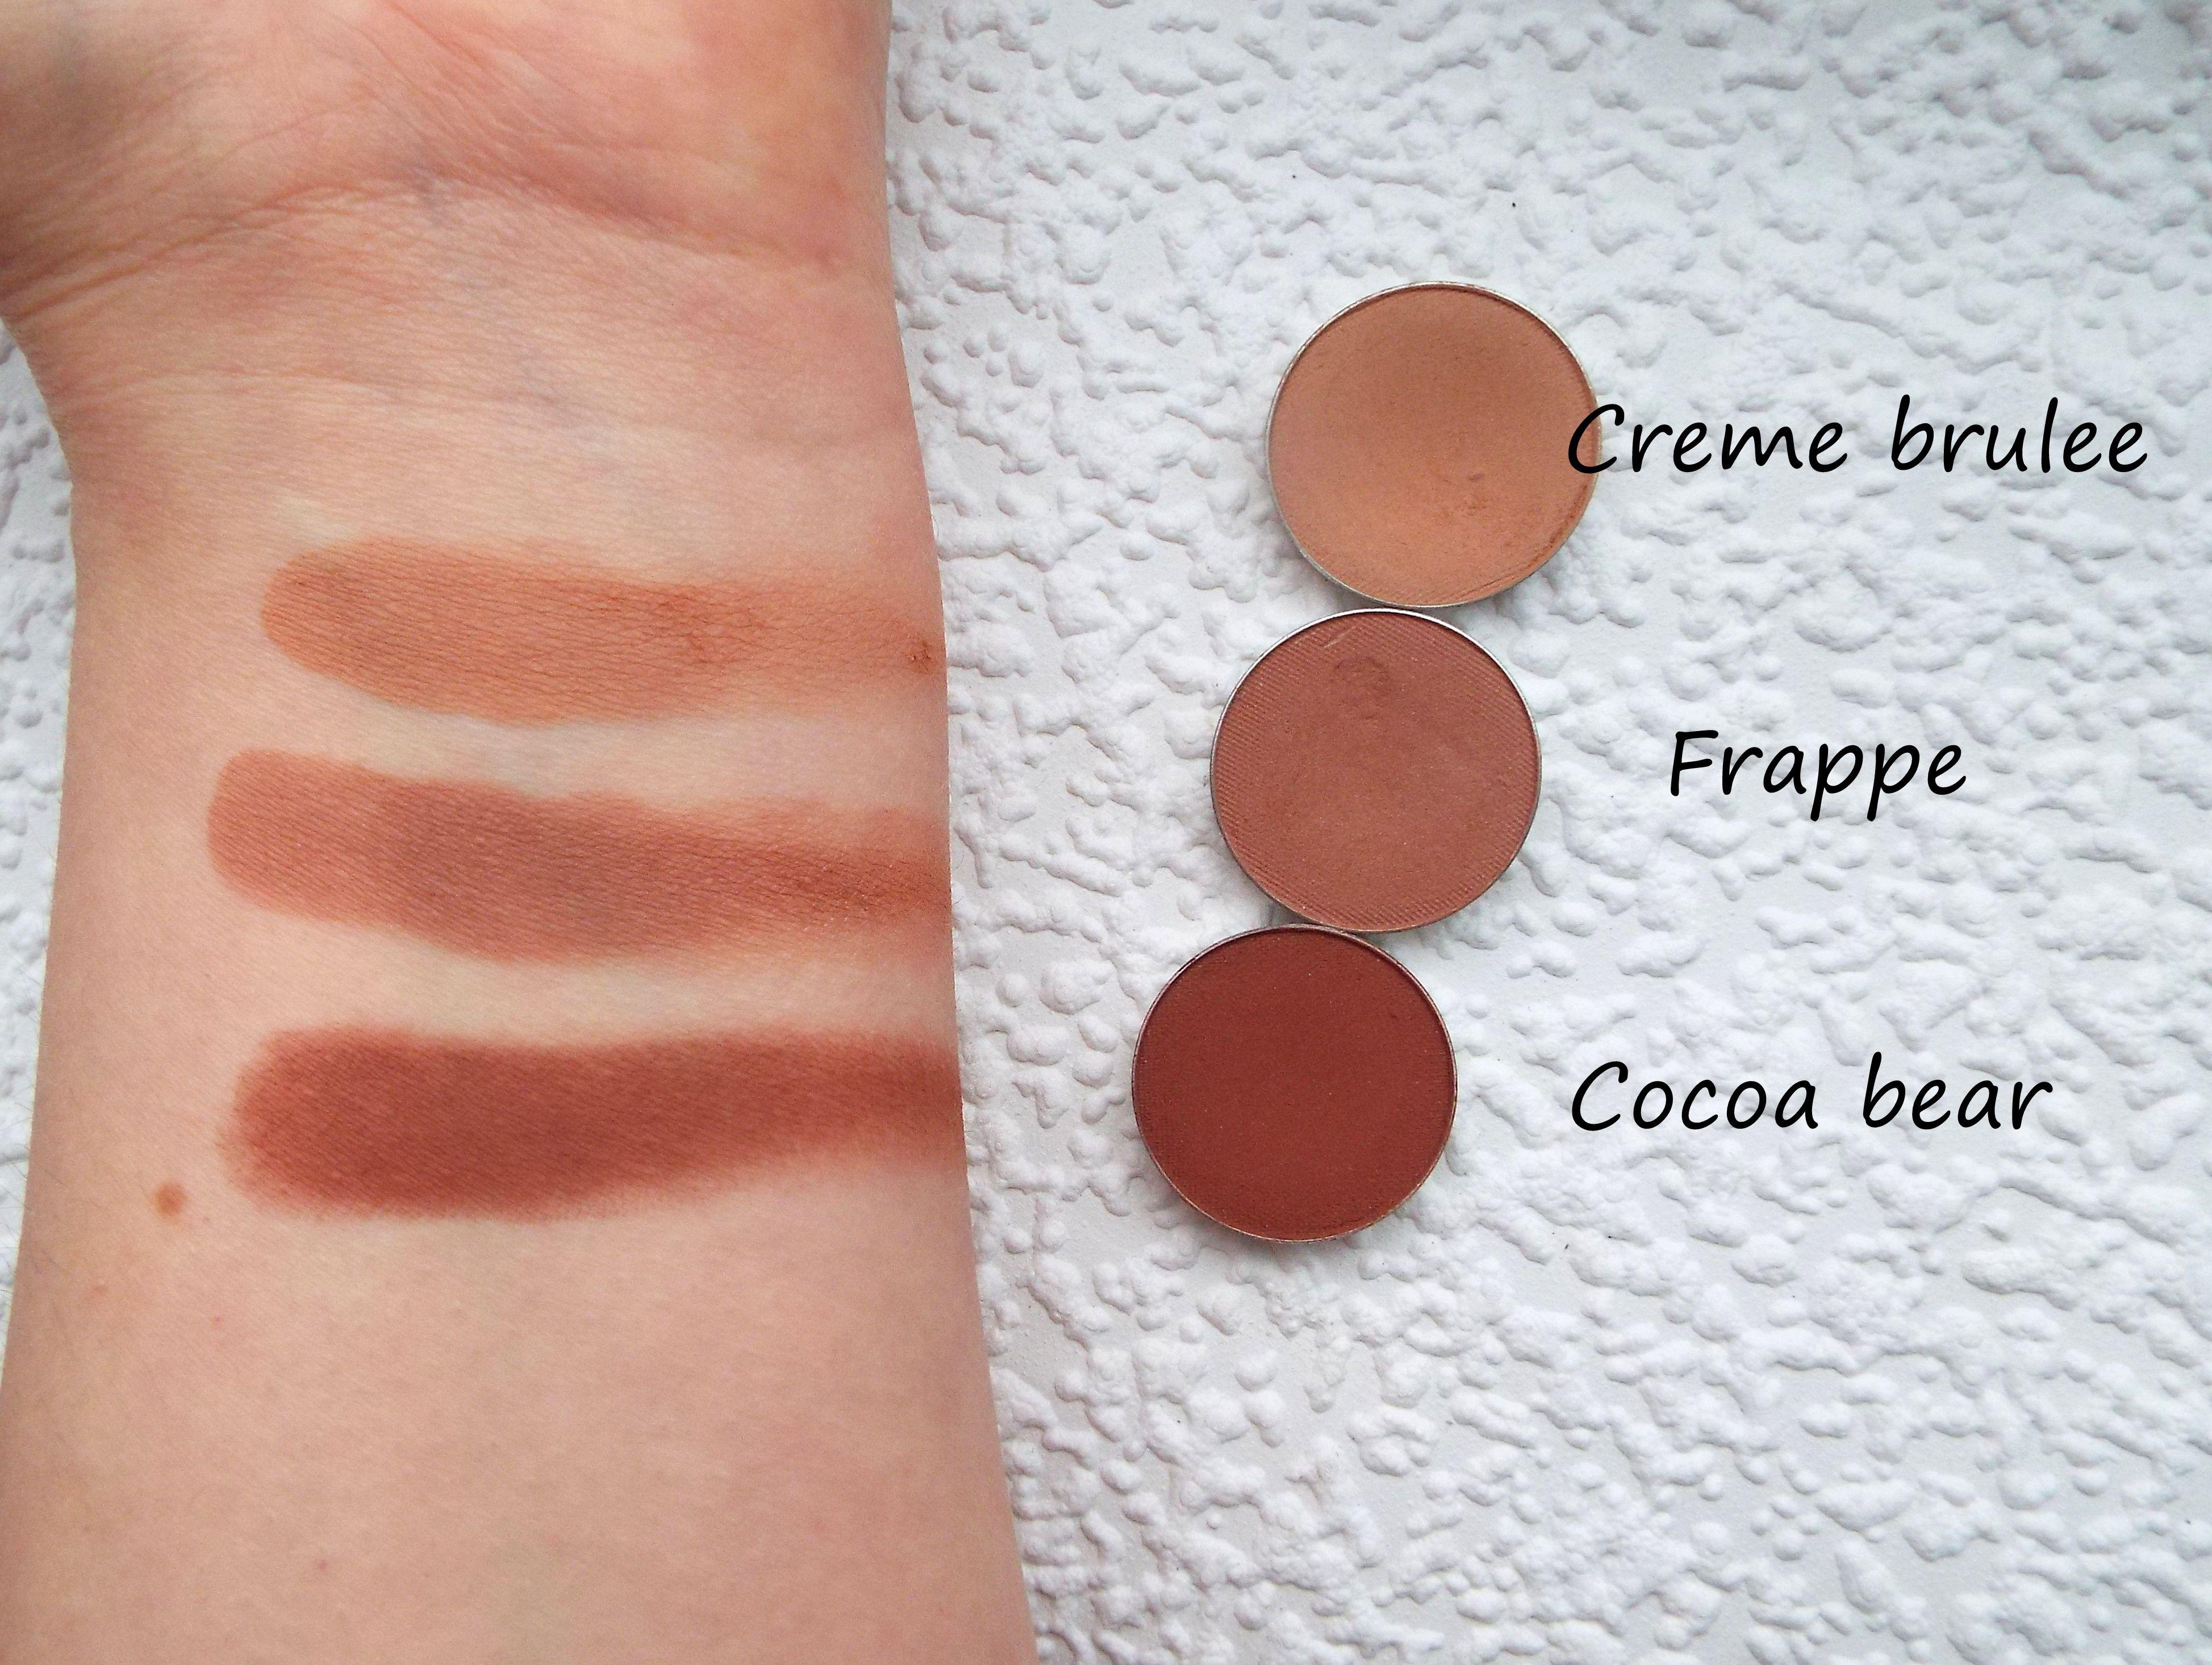 Creme Brulee Frappe Cocoa Bear Makeup Geek Swatch Makeup Geek Swatches Makeup Geek Simple Nail Designs